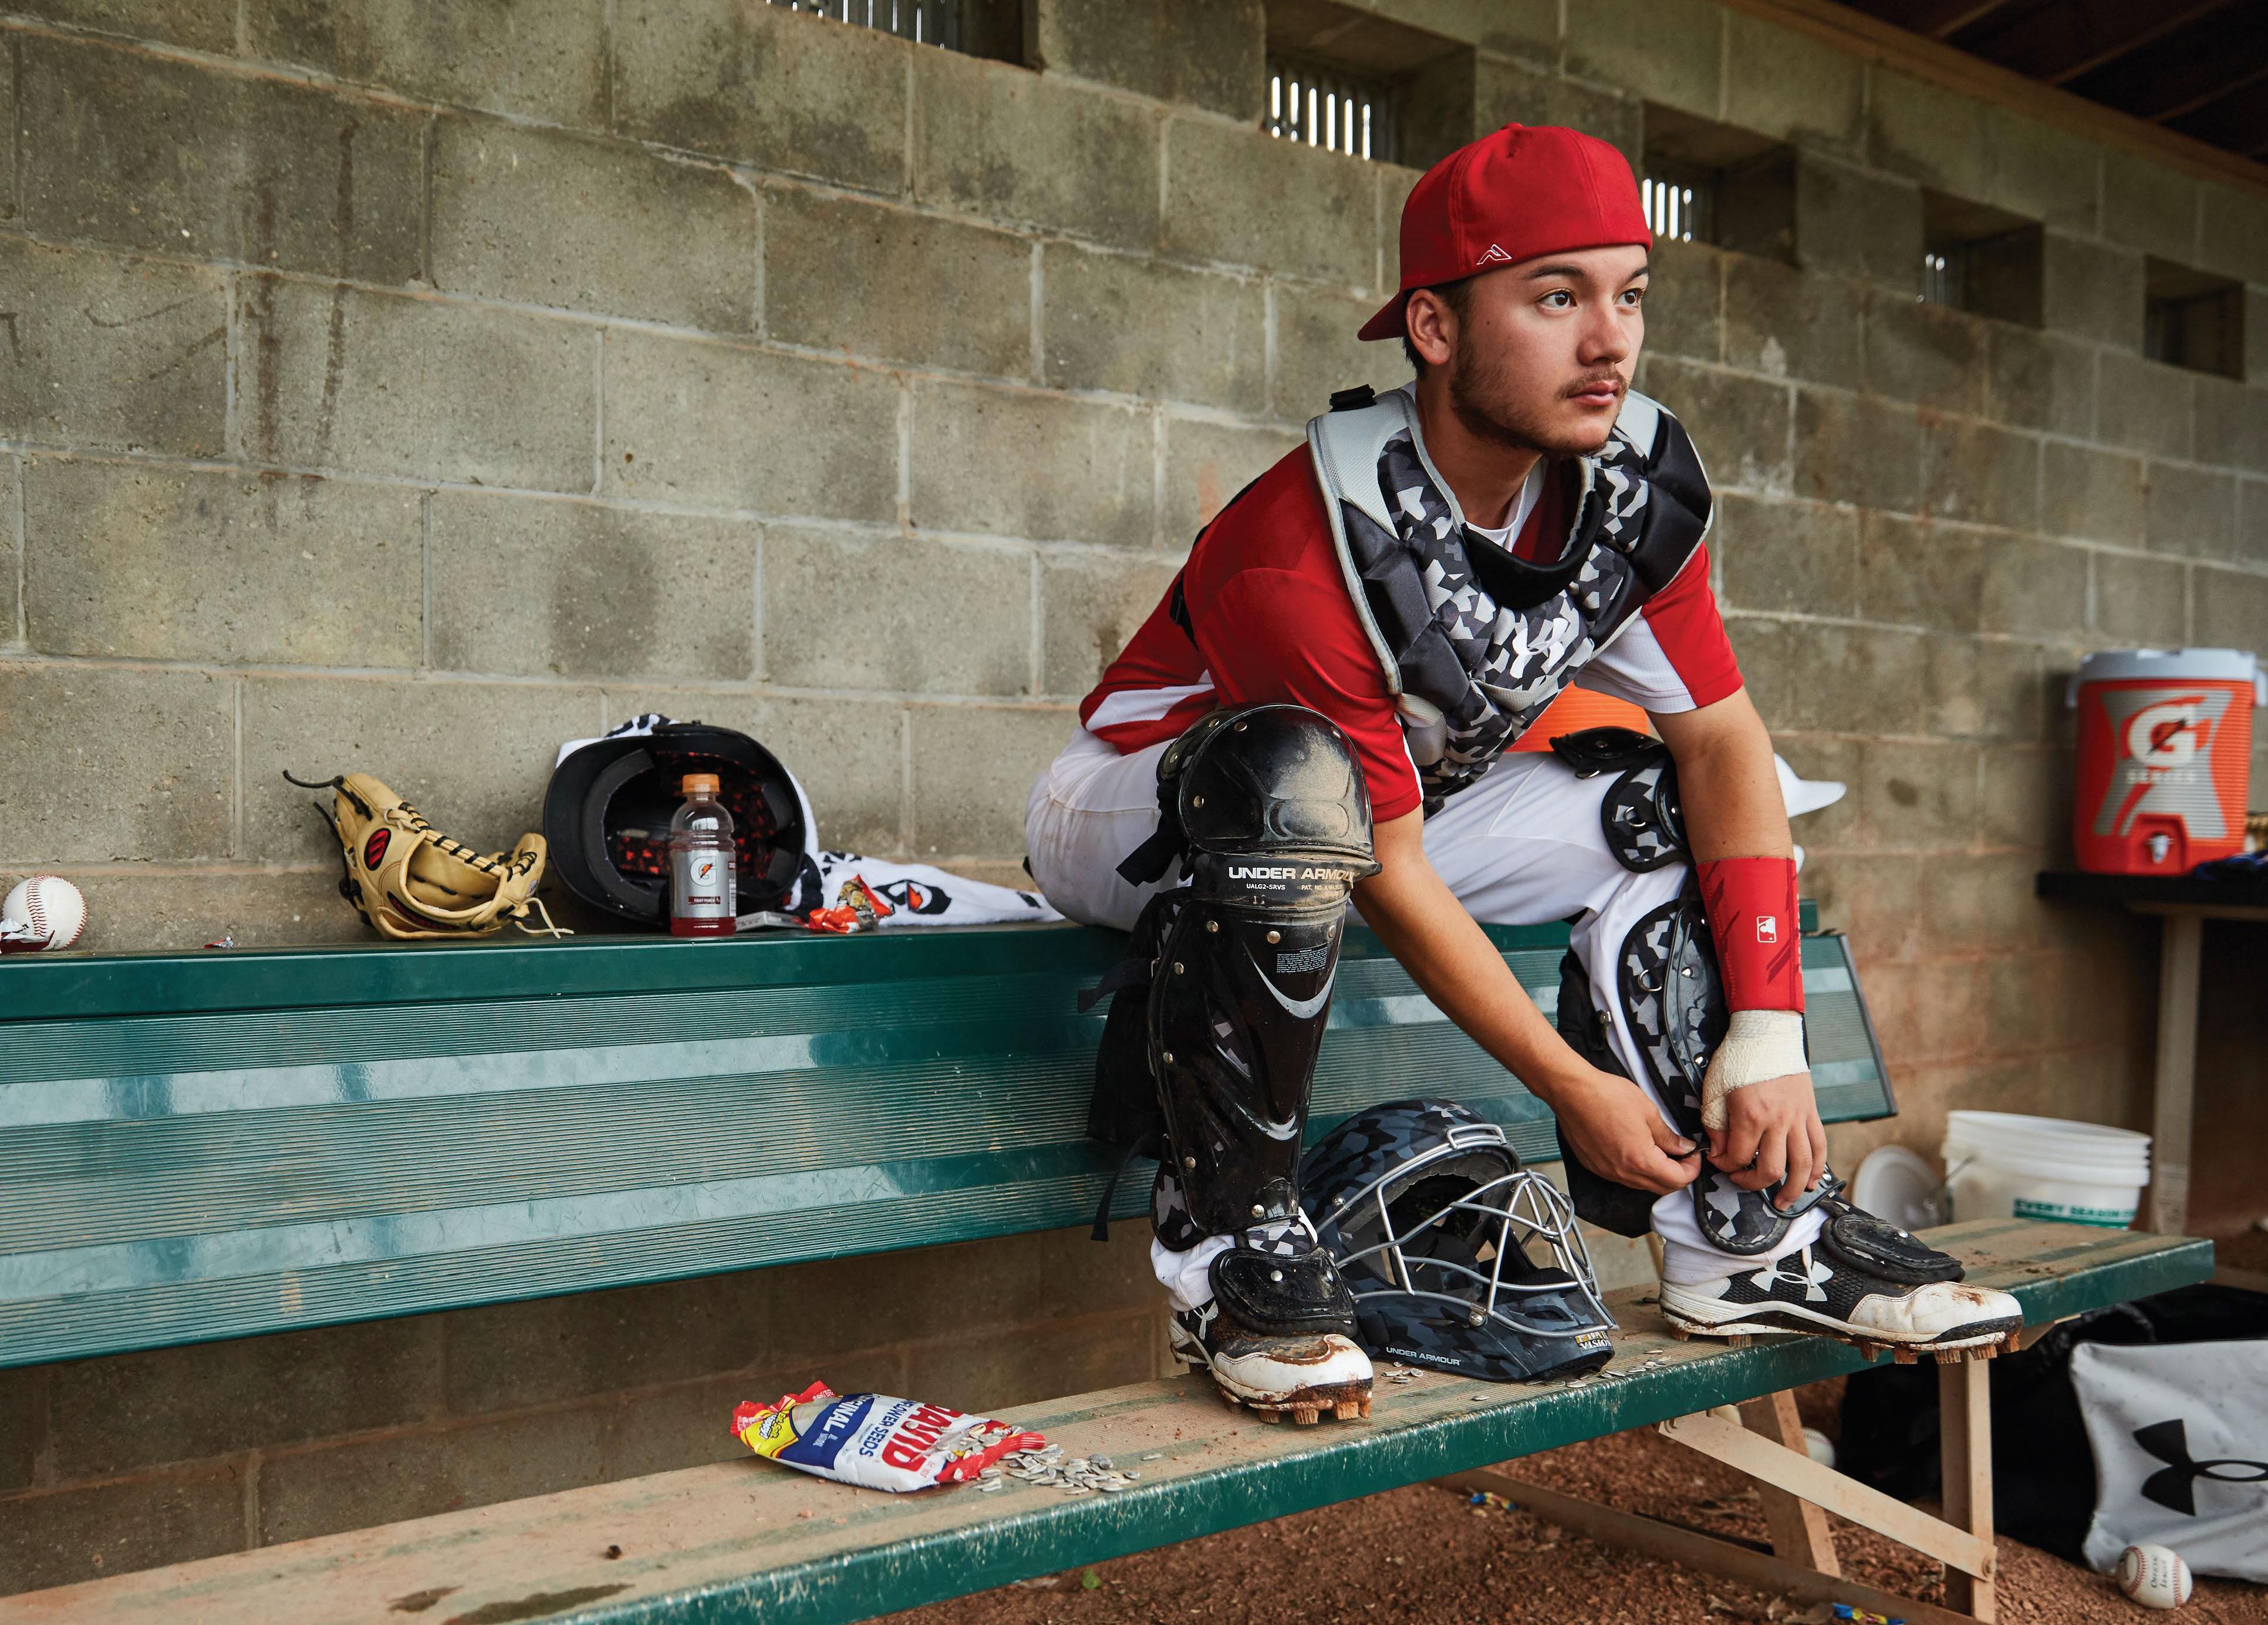 Baseball Catcher's Equipment